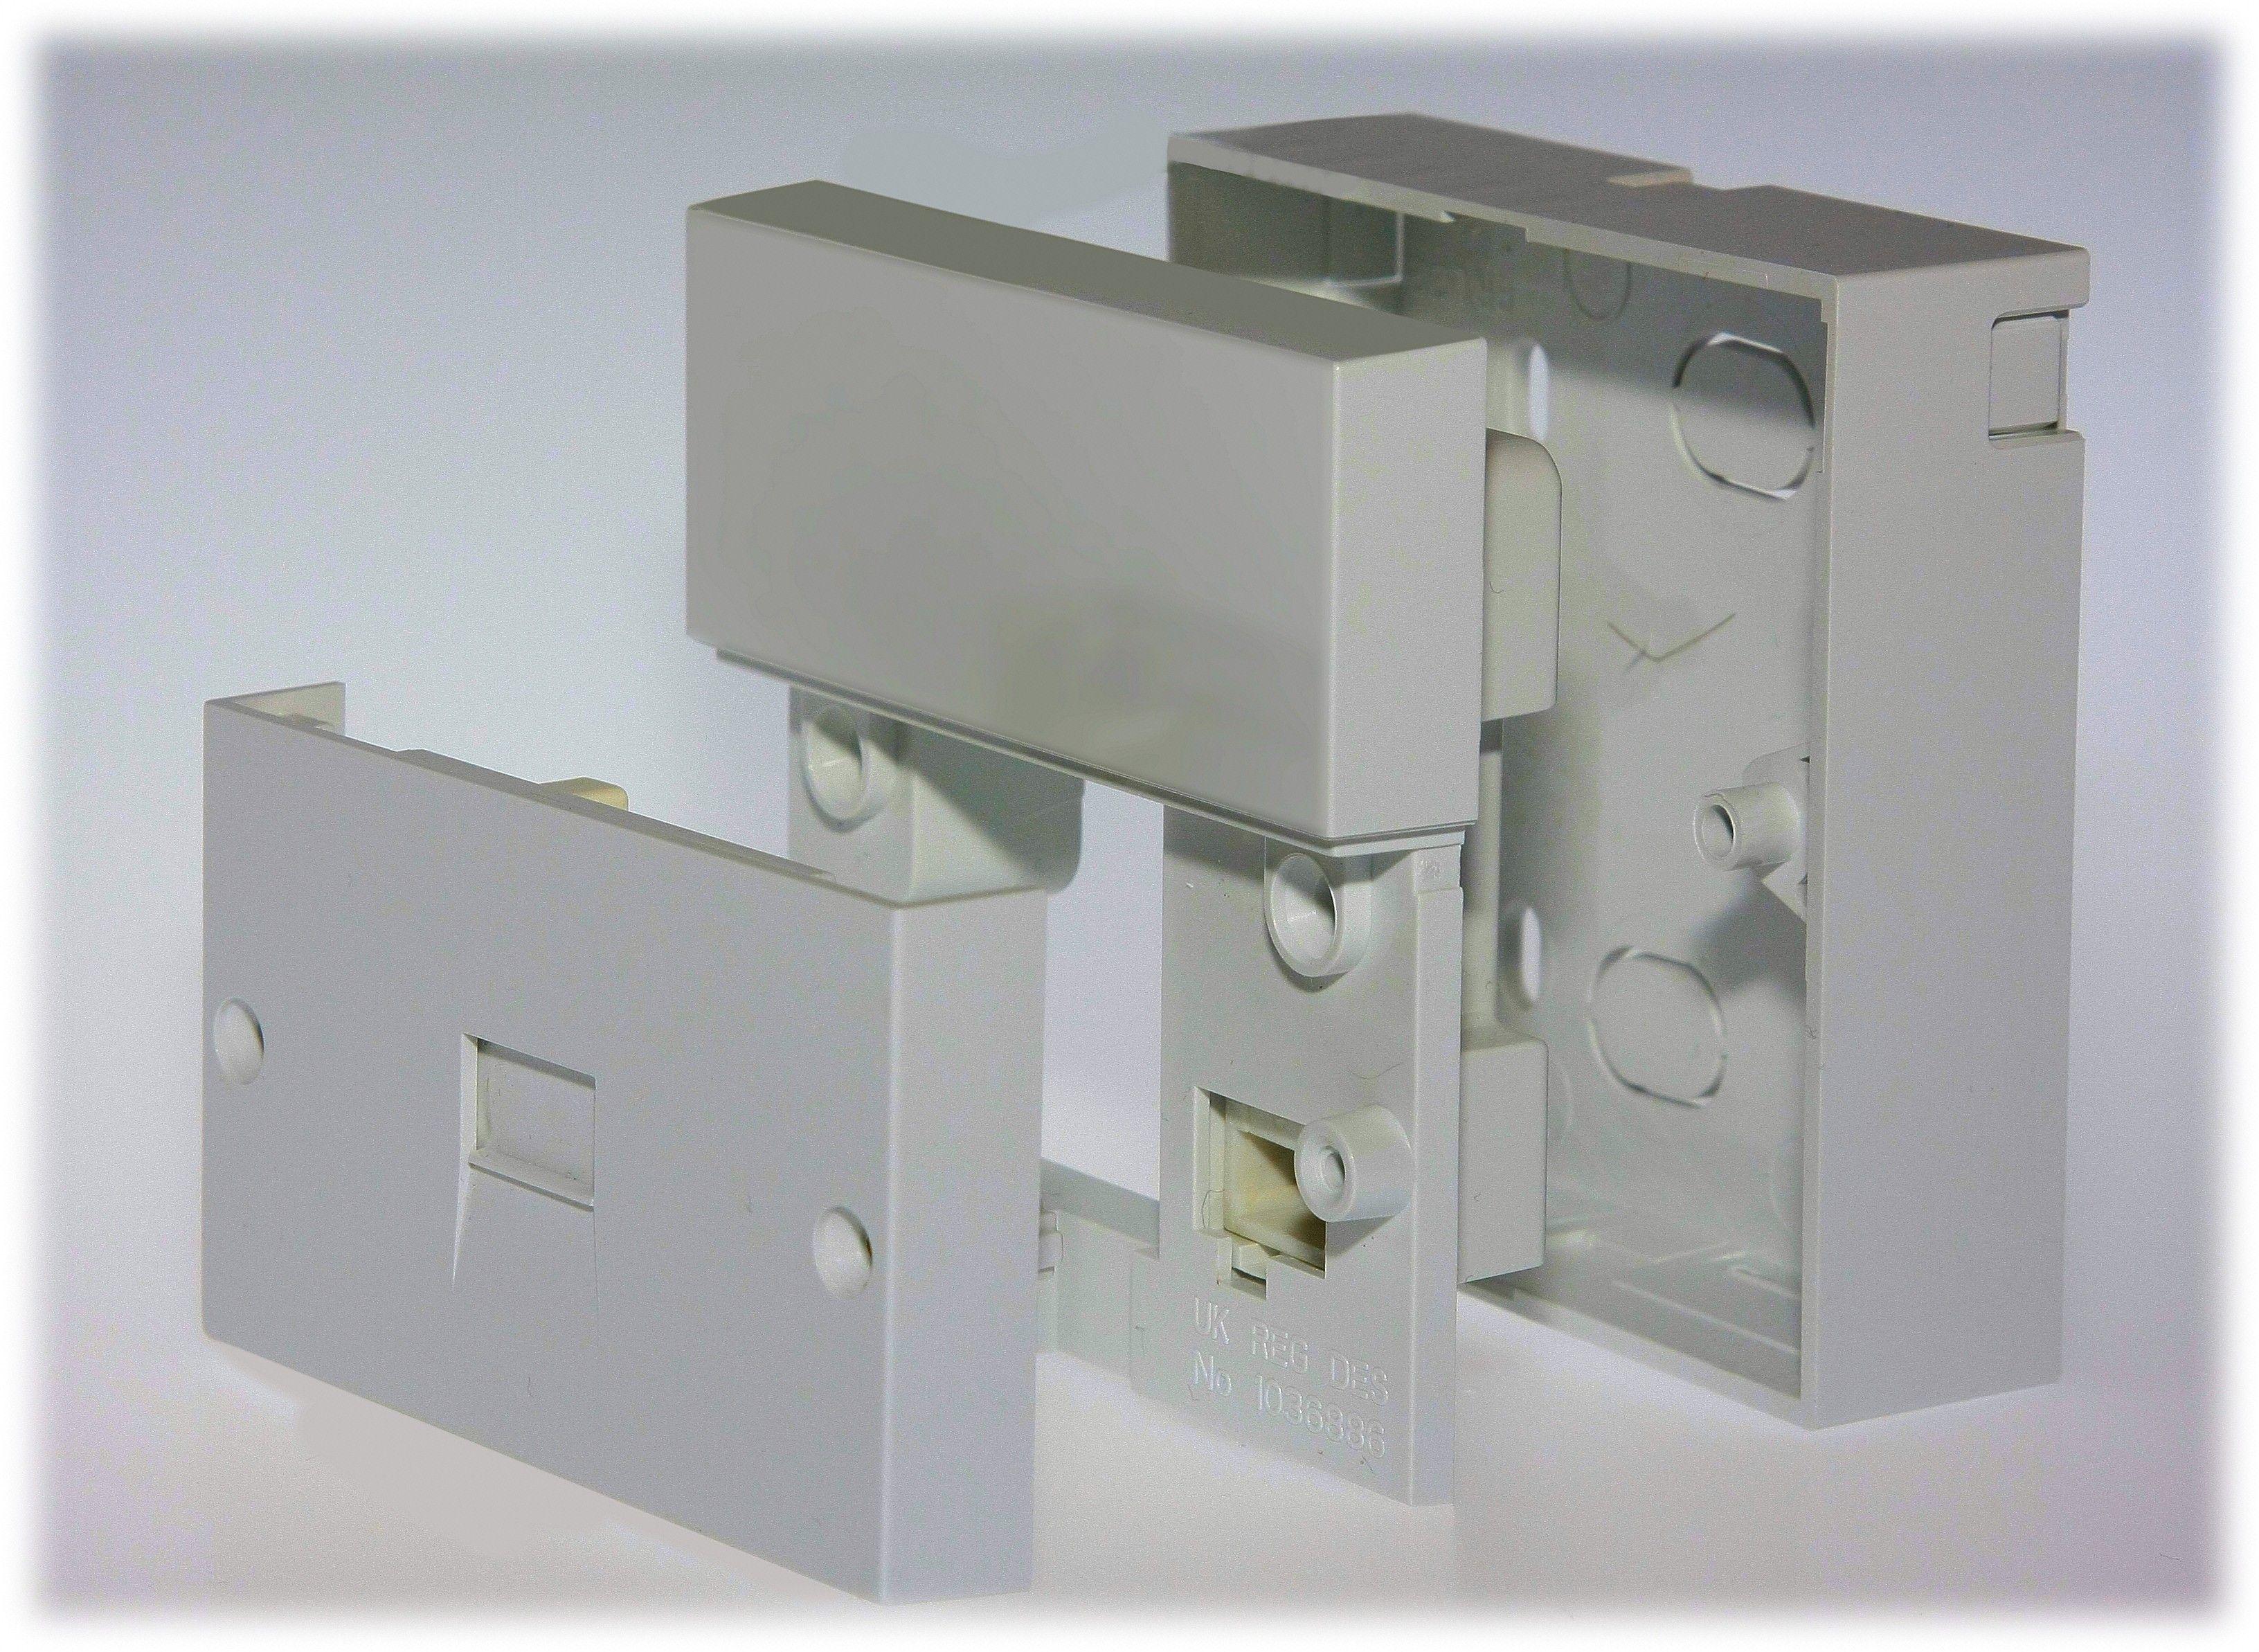 New Bt Master Socket Nte5 Wiring Diagram Con Imagenes